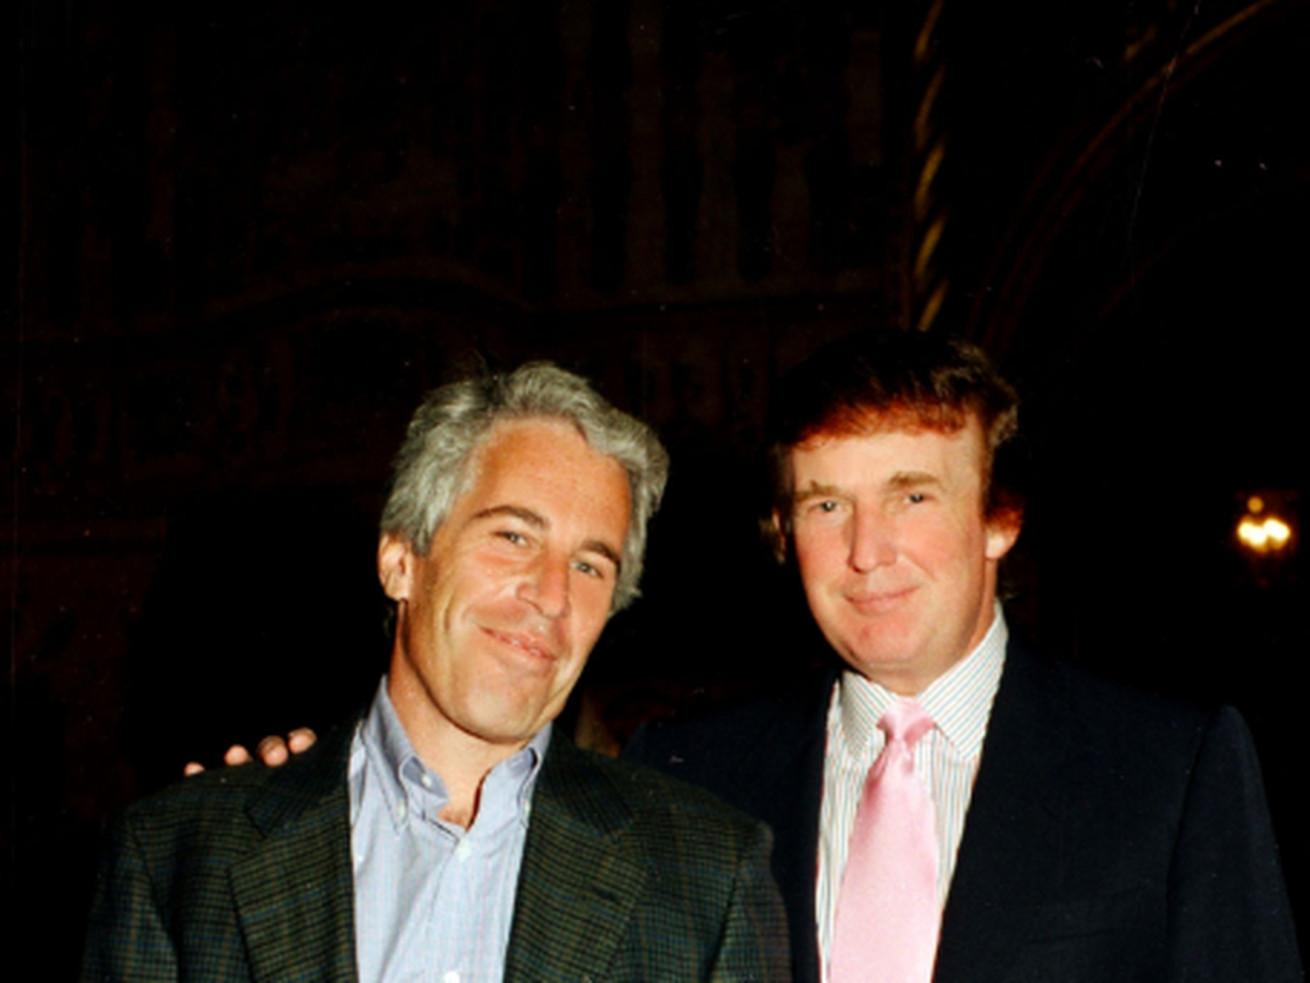 Did Pedophile Jeffrey Epstein Work for Mossad?